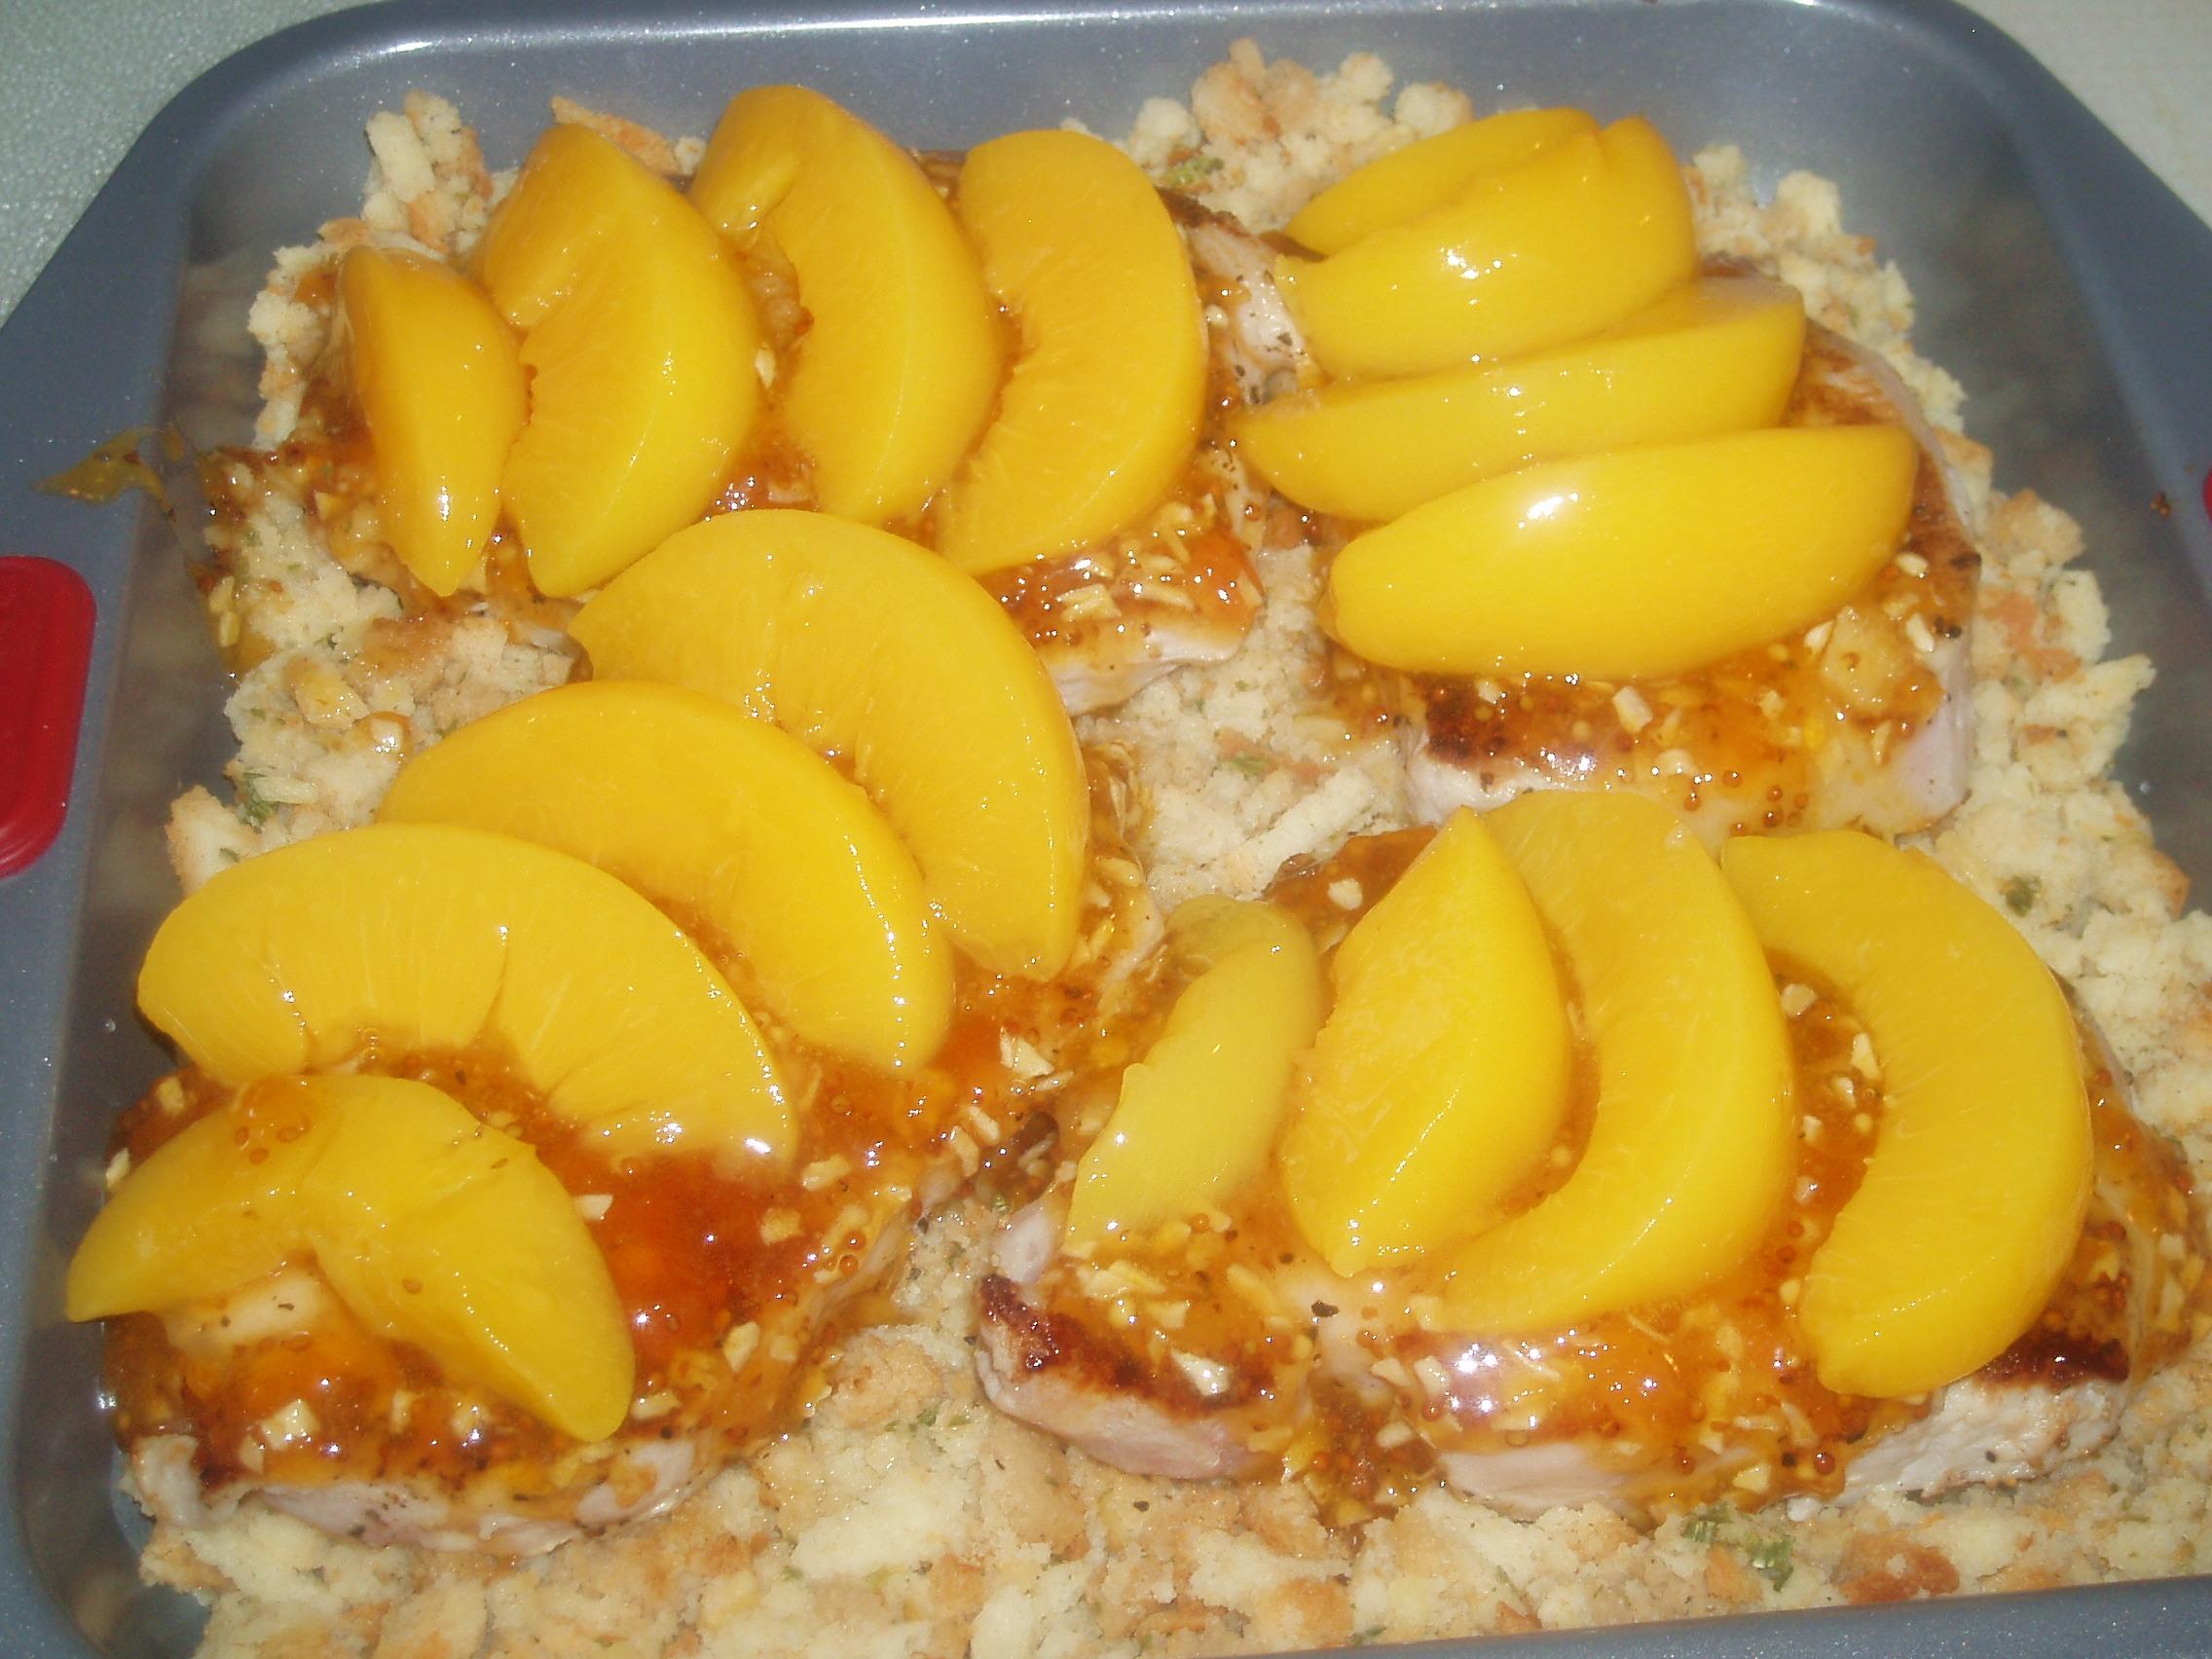 Name:  peachy pork chops 8.jpg.JPG Views: 1156 Size:  864.5 KB